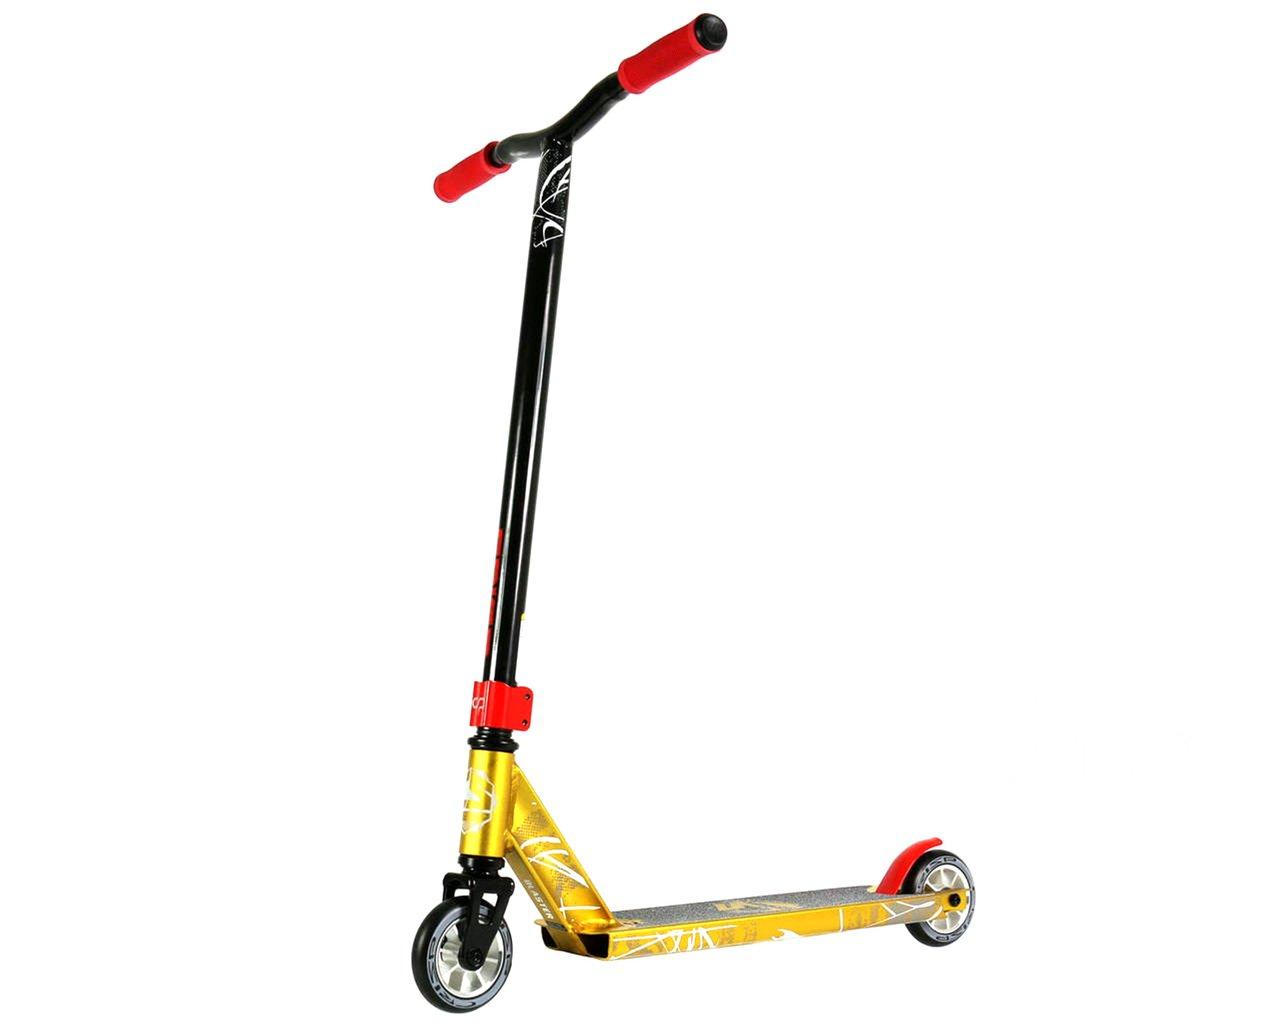 Crisp Blaster Pro Stunt Scooter